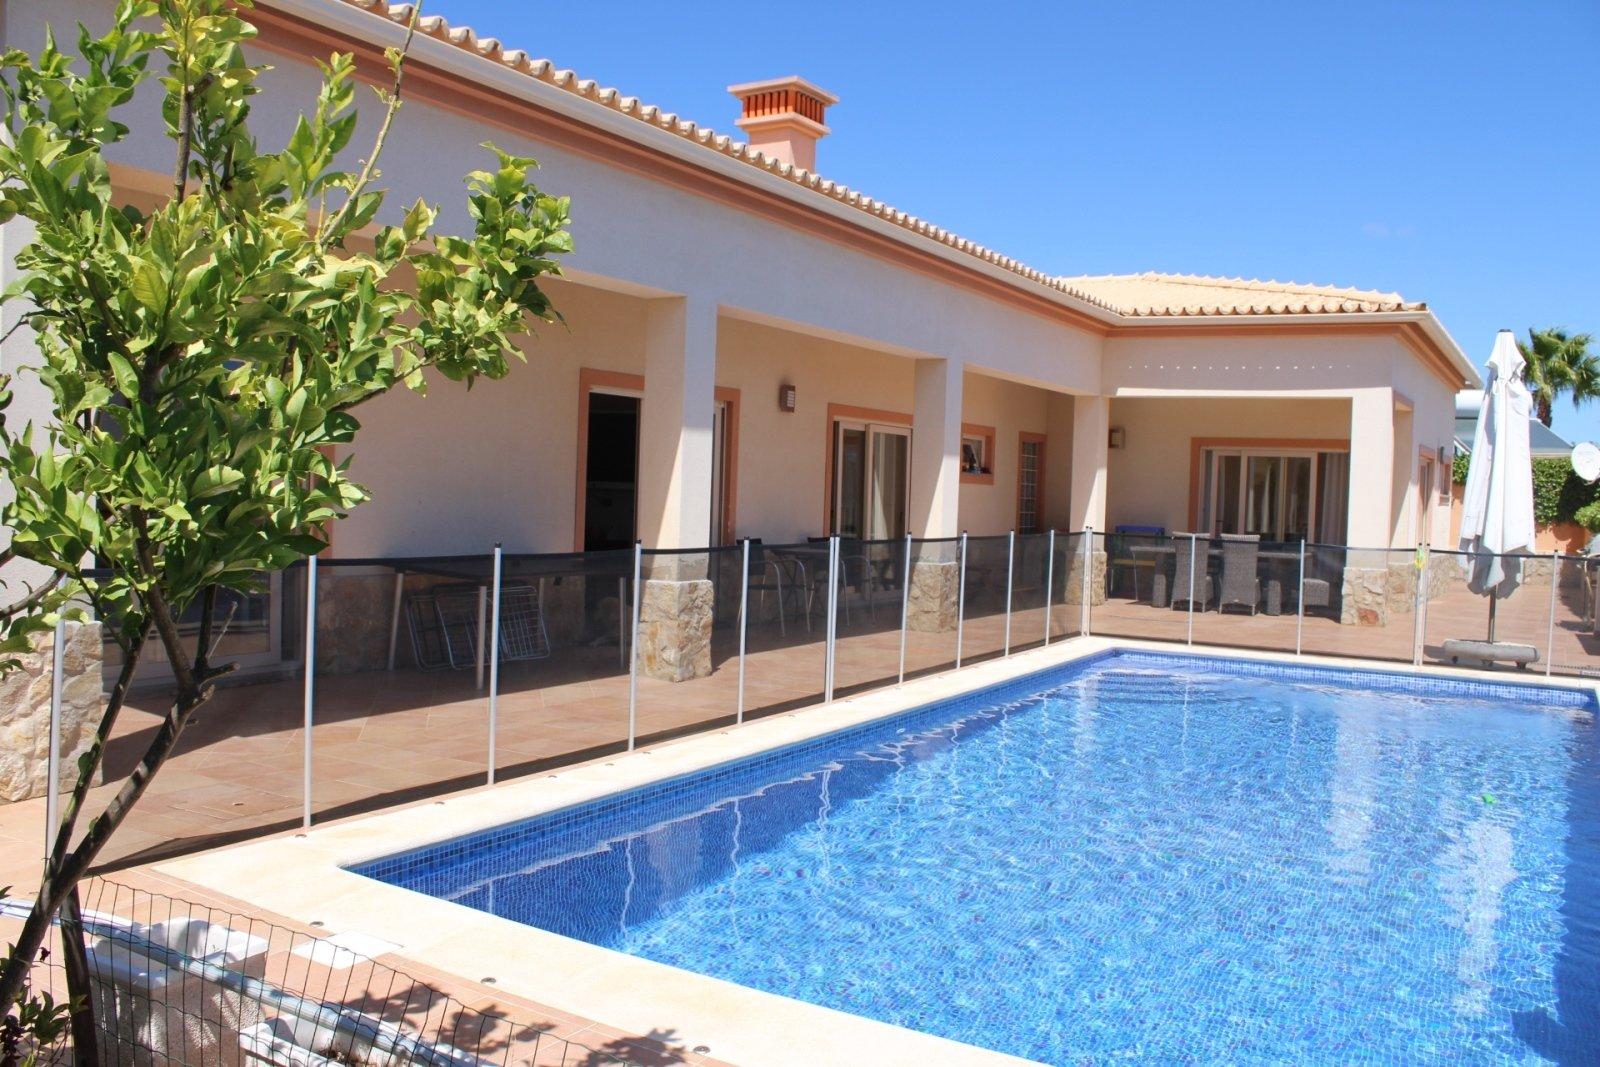 3 Bedroom Villa Praia da Luz, Western Algarve Ref: GV603